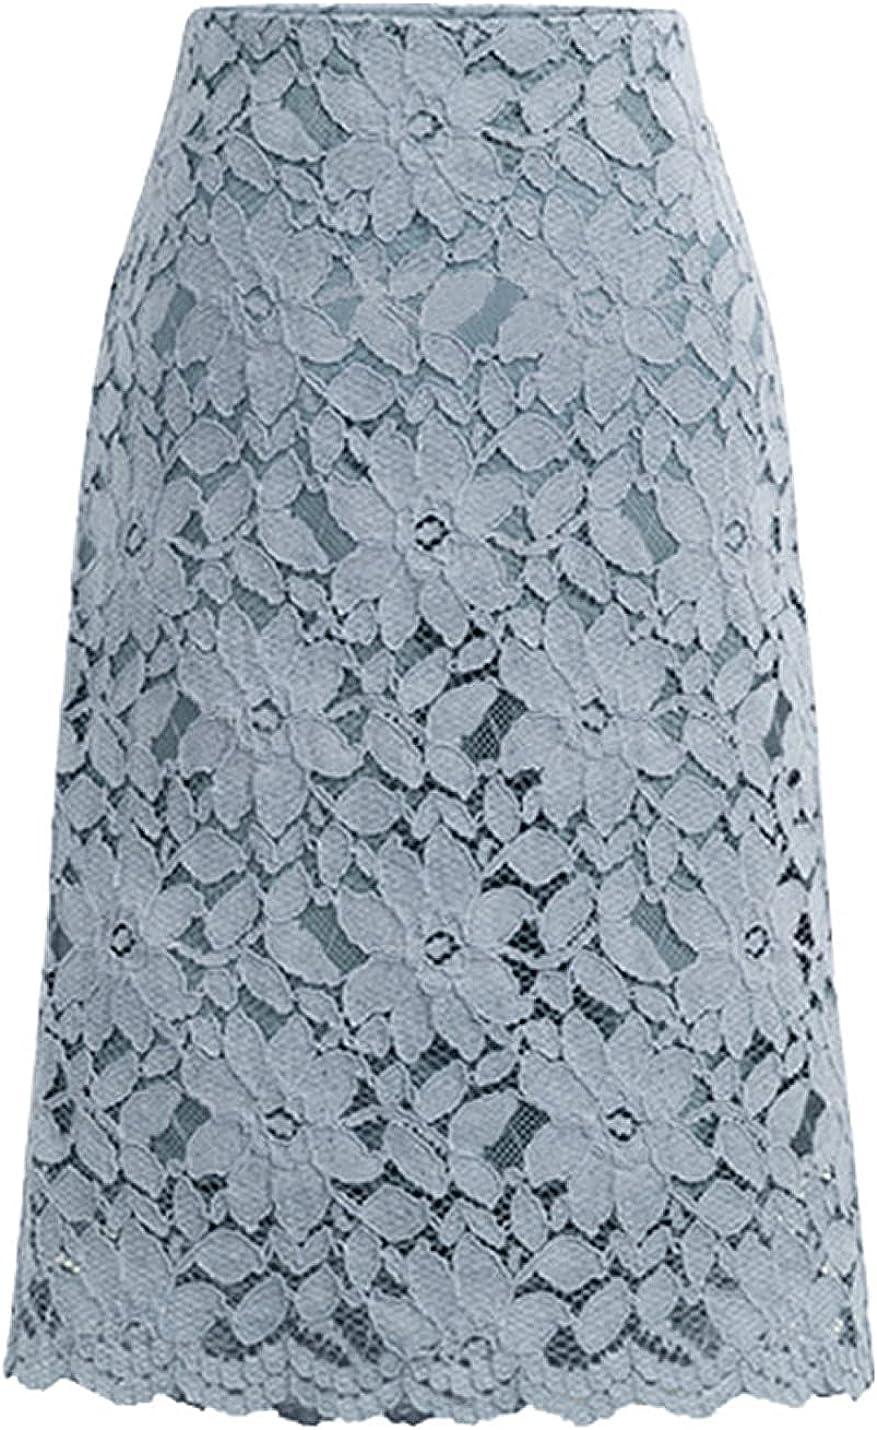 COWOKA Women's Elegant Floral Lace Skirt Elastic Waist Wear to Work Fleece Pencil Skirt Wrapped Hip Skirt